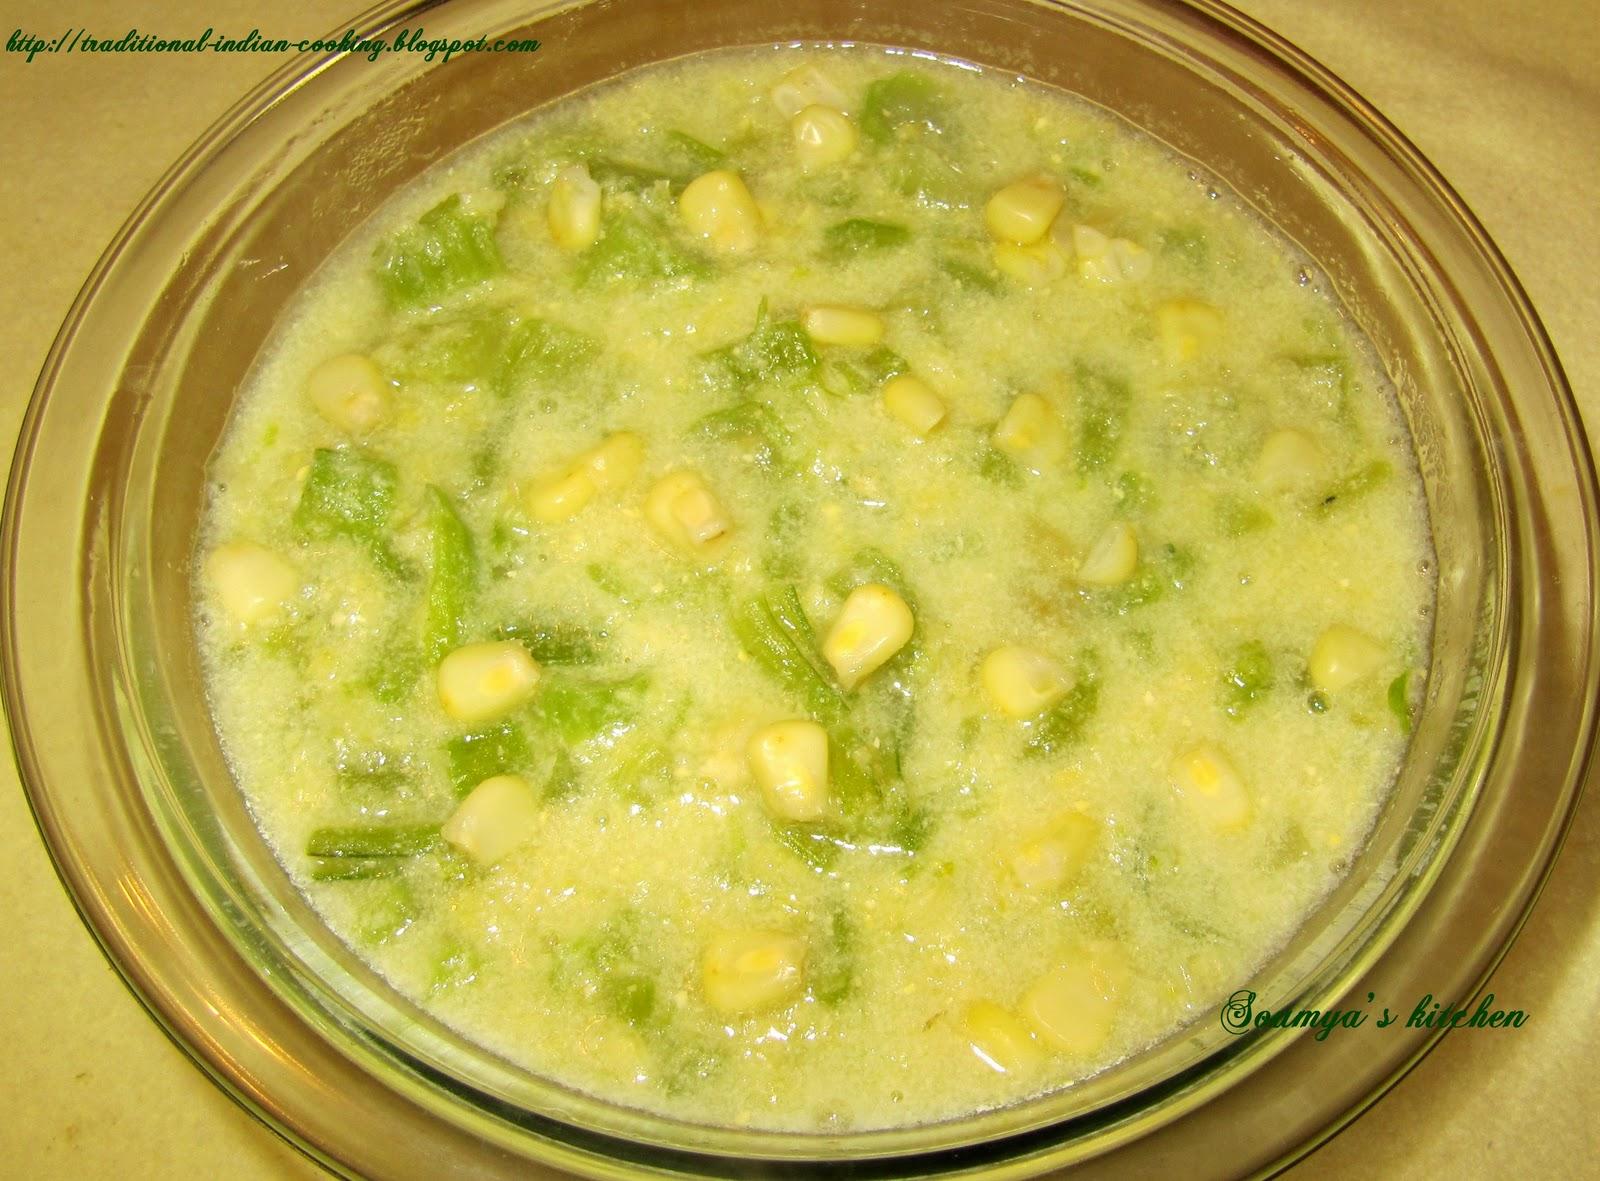 Soumya's kitchen: CELERY AND SWEET CORN SOUP